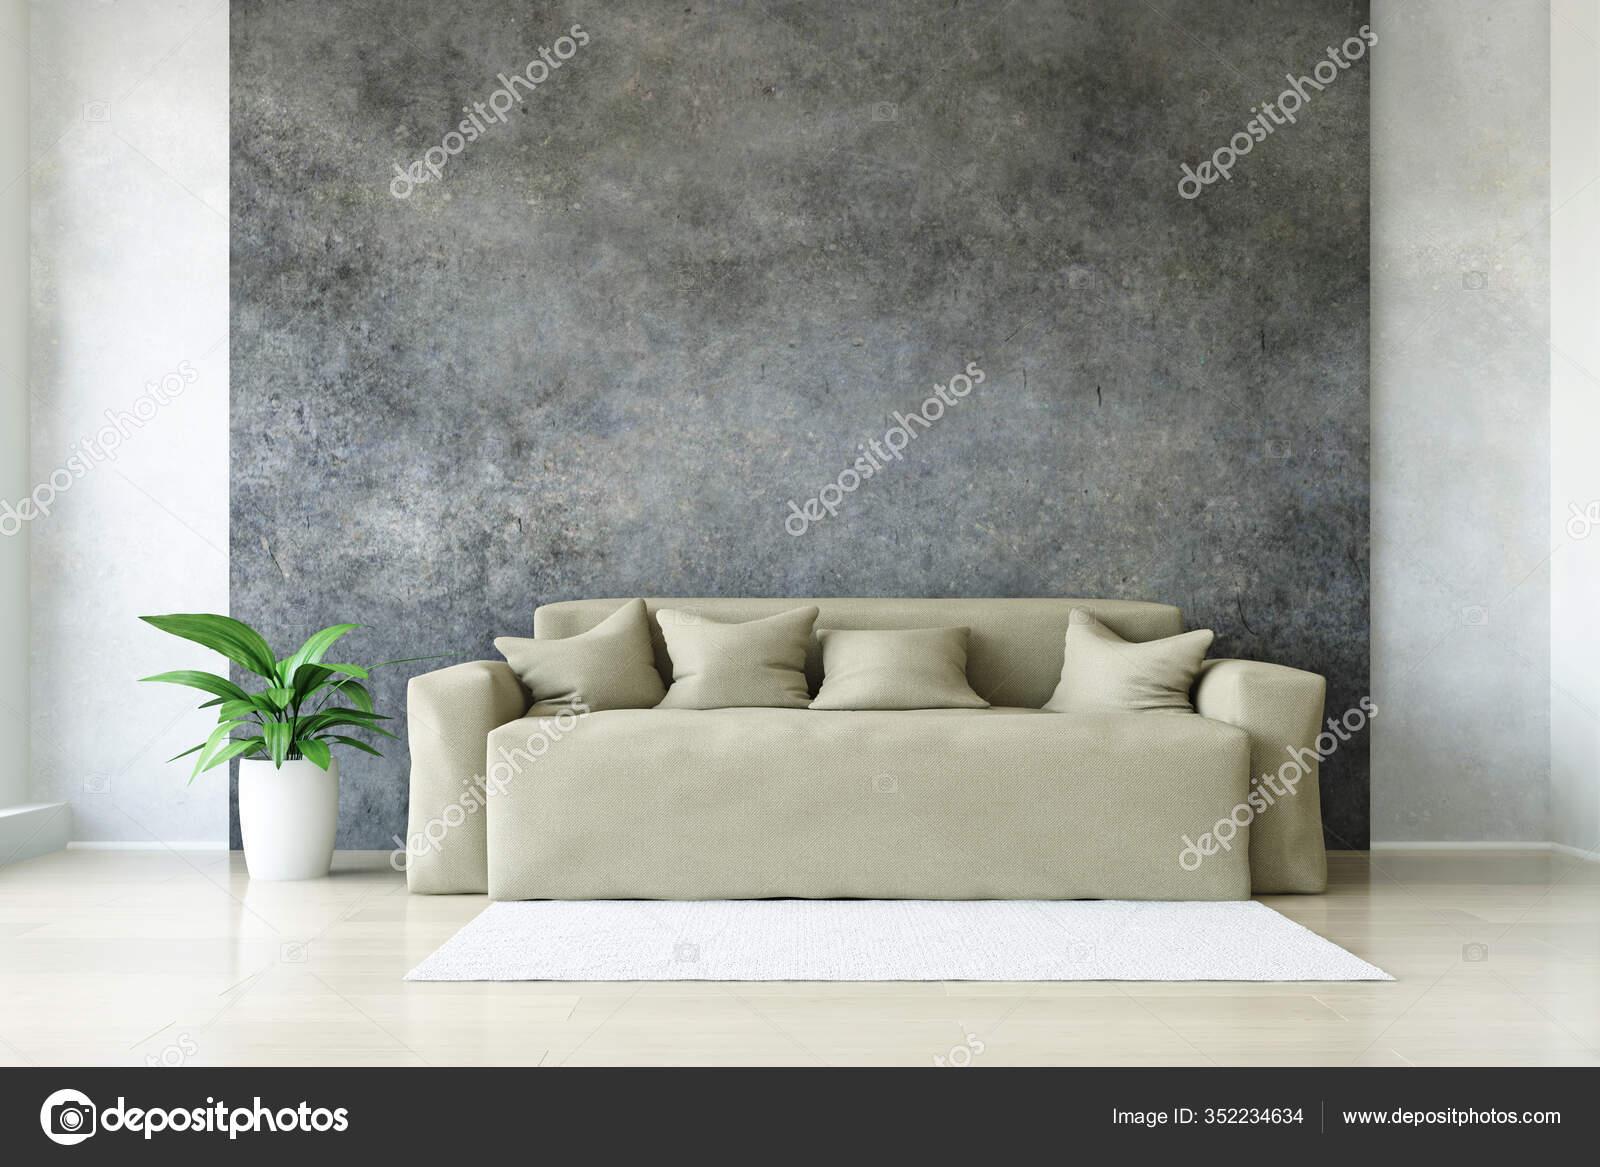 Modern Beige Sofa Pillows Plant Stylish Dirty Concrete Wall White Stock Photo C Ciklamen 352234634